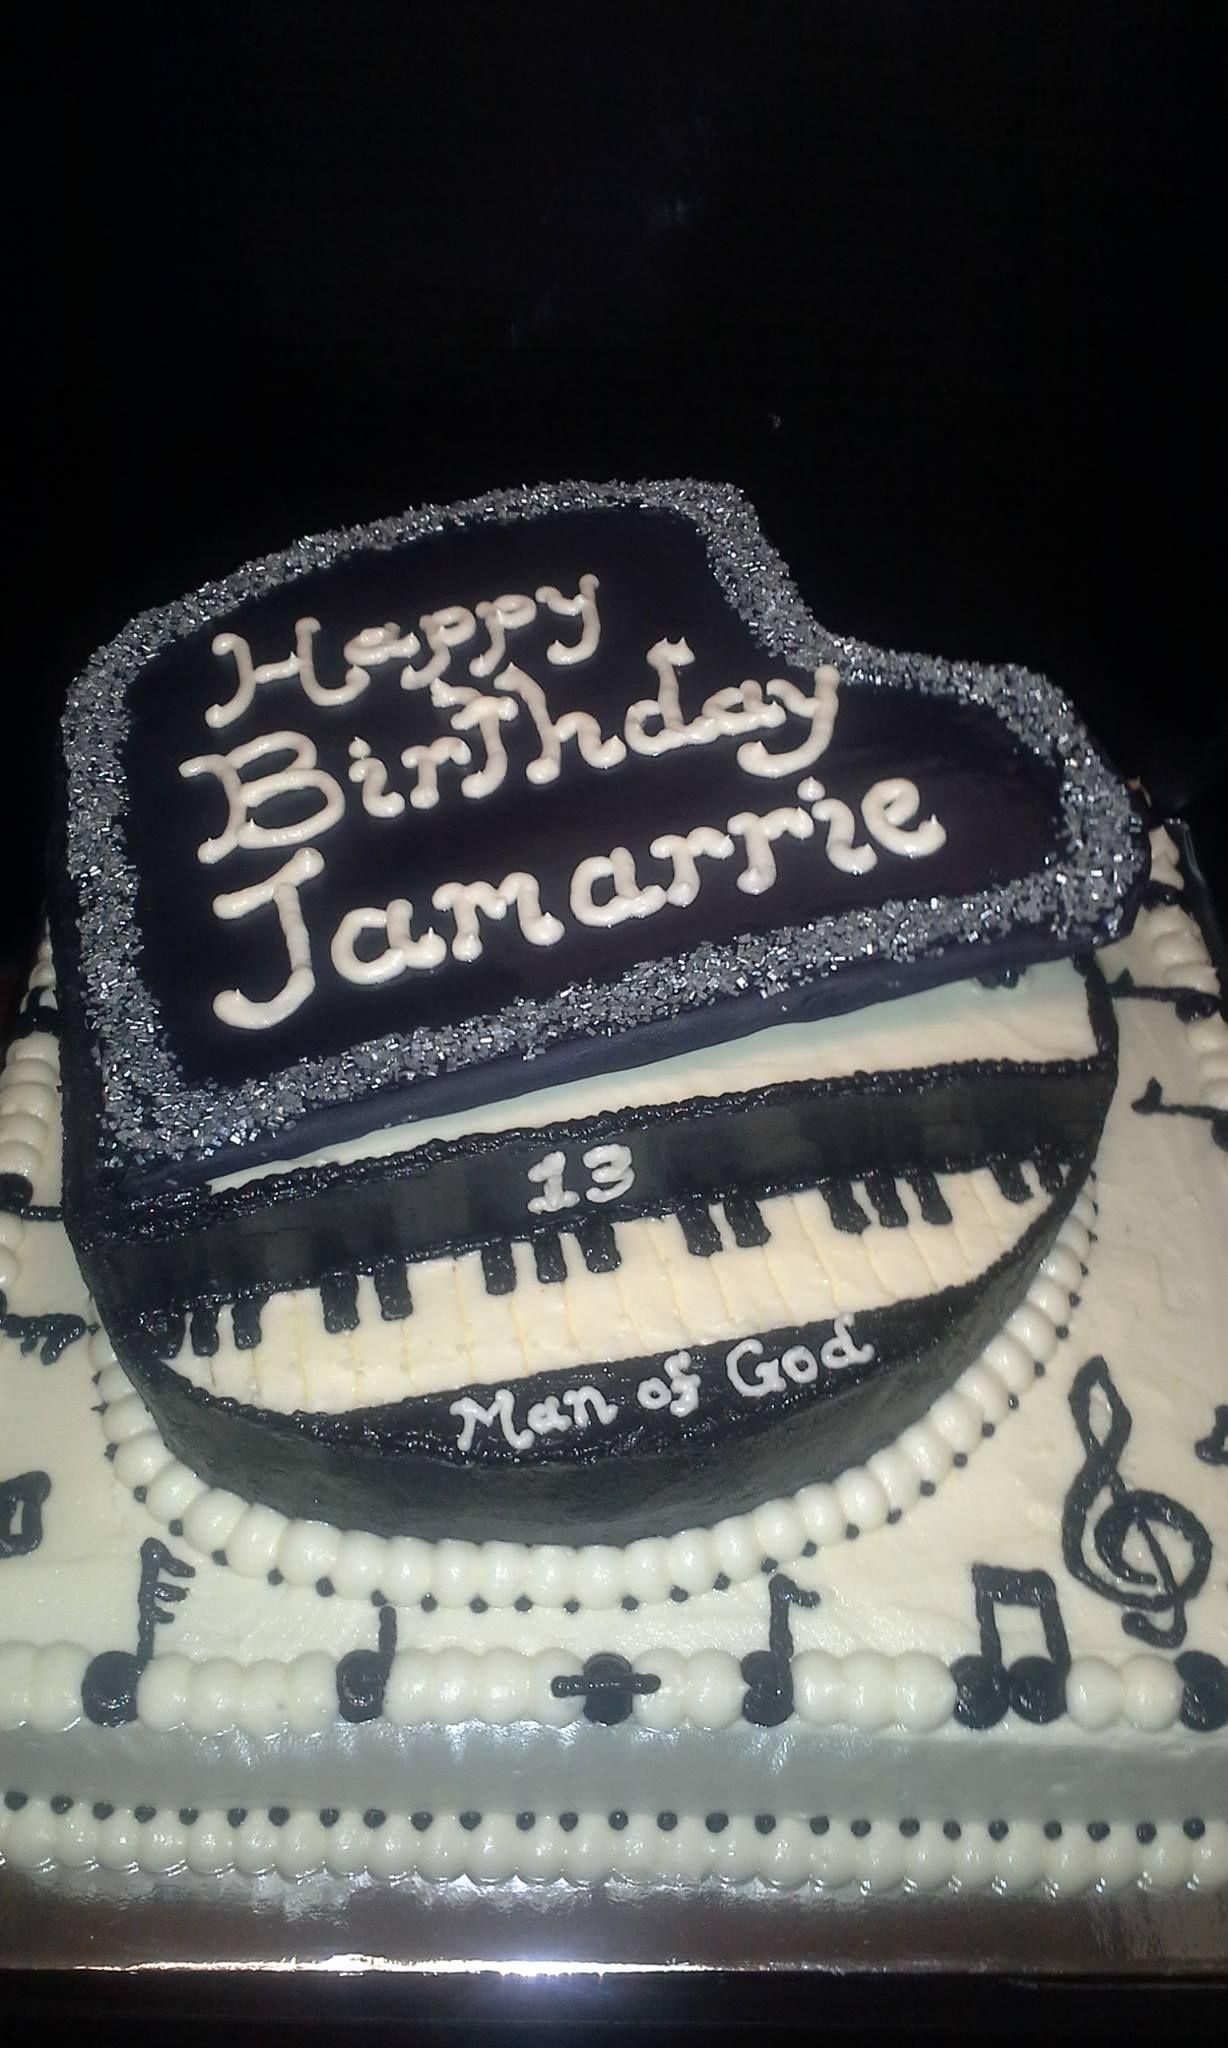 Phenomenal Birthday Cakes Durham Nc The Cake Boutique Funny Birthday Cards Online Elaedamsfinfo